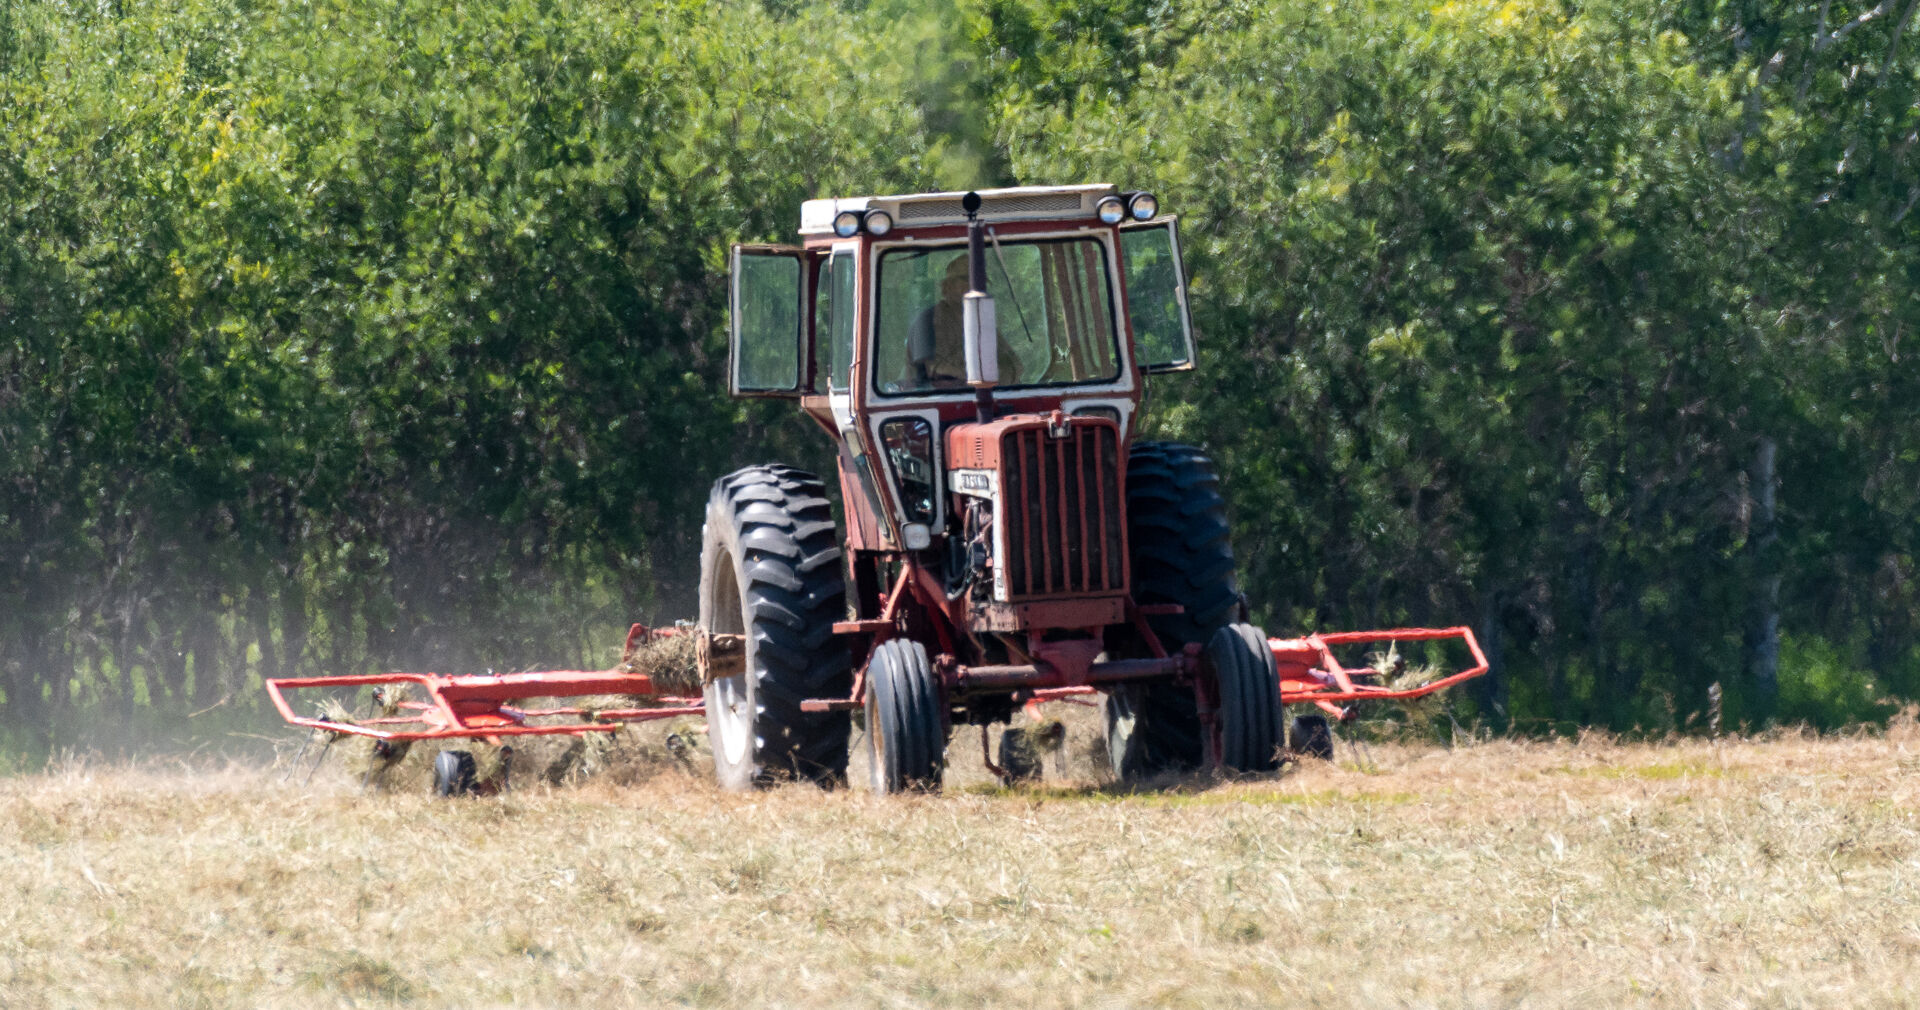 Summer Farming Season Underway Local Mesabitribune